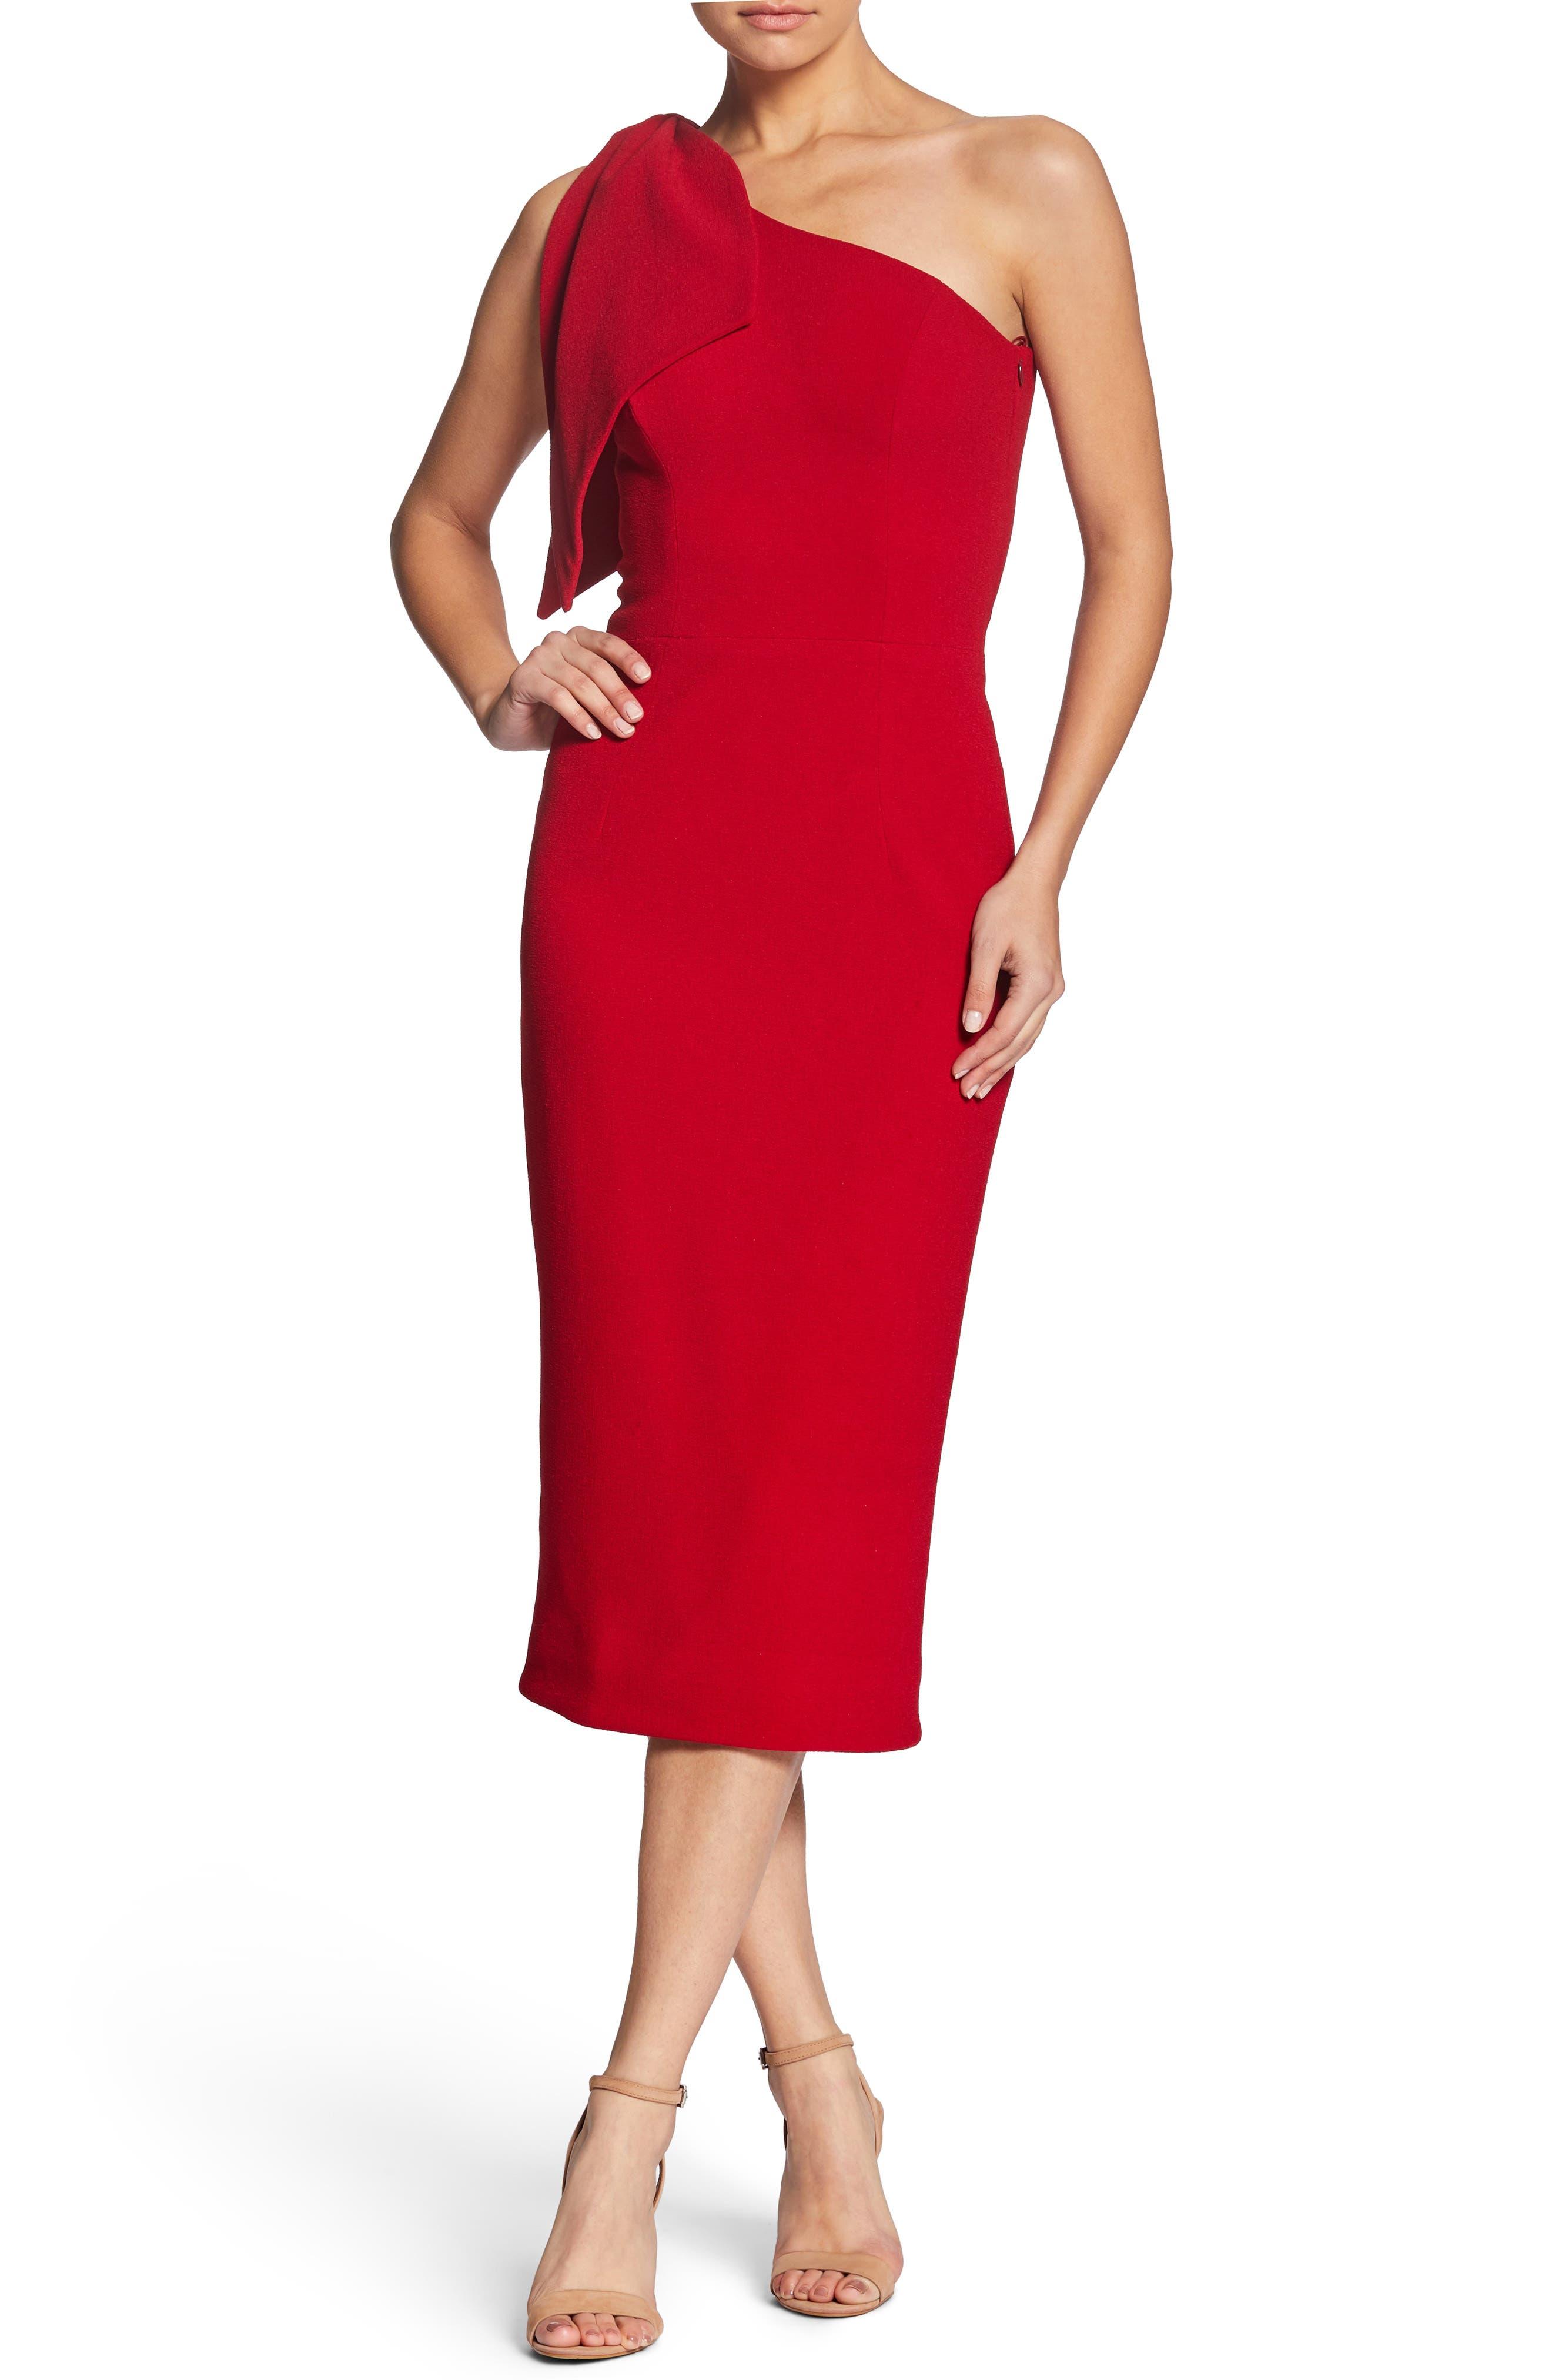 Tiffany One-Shoulder Midi Dress,                         Main,                         color, Garnet